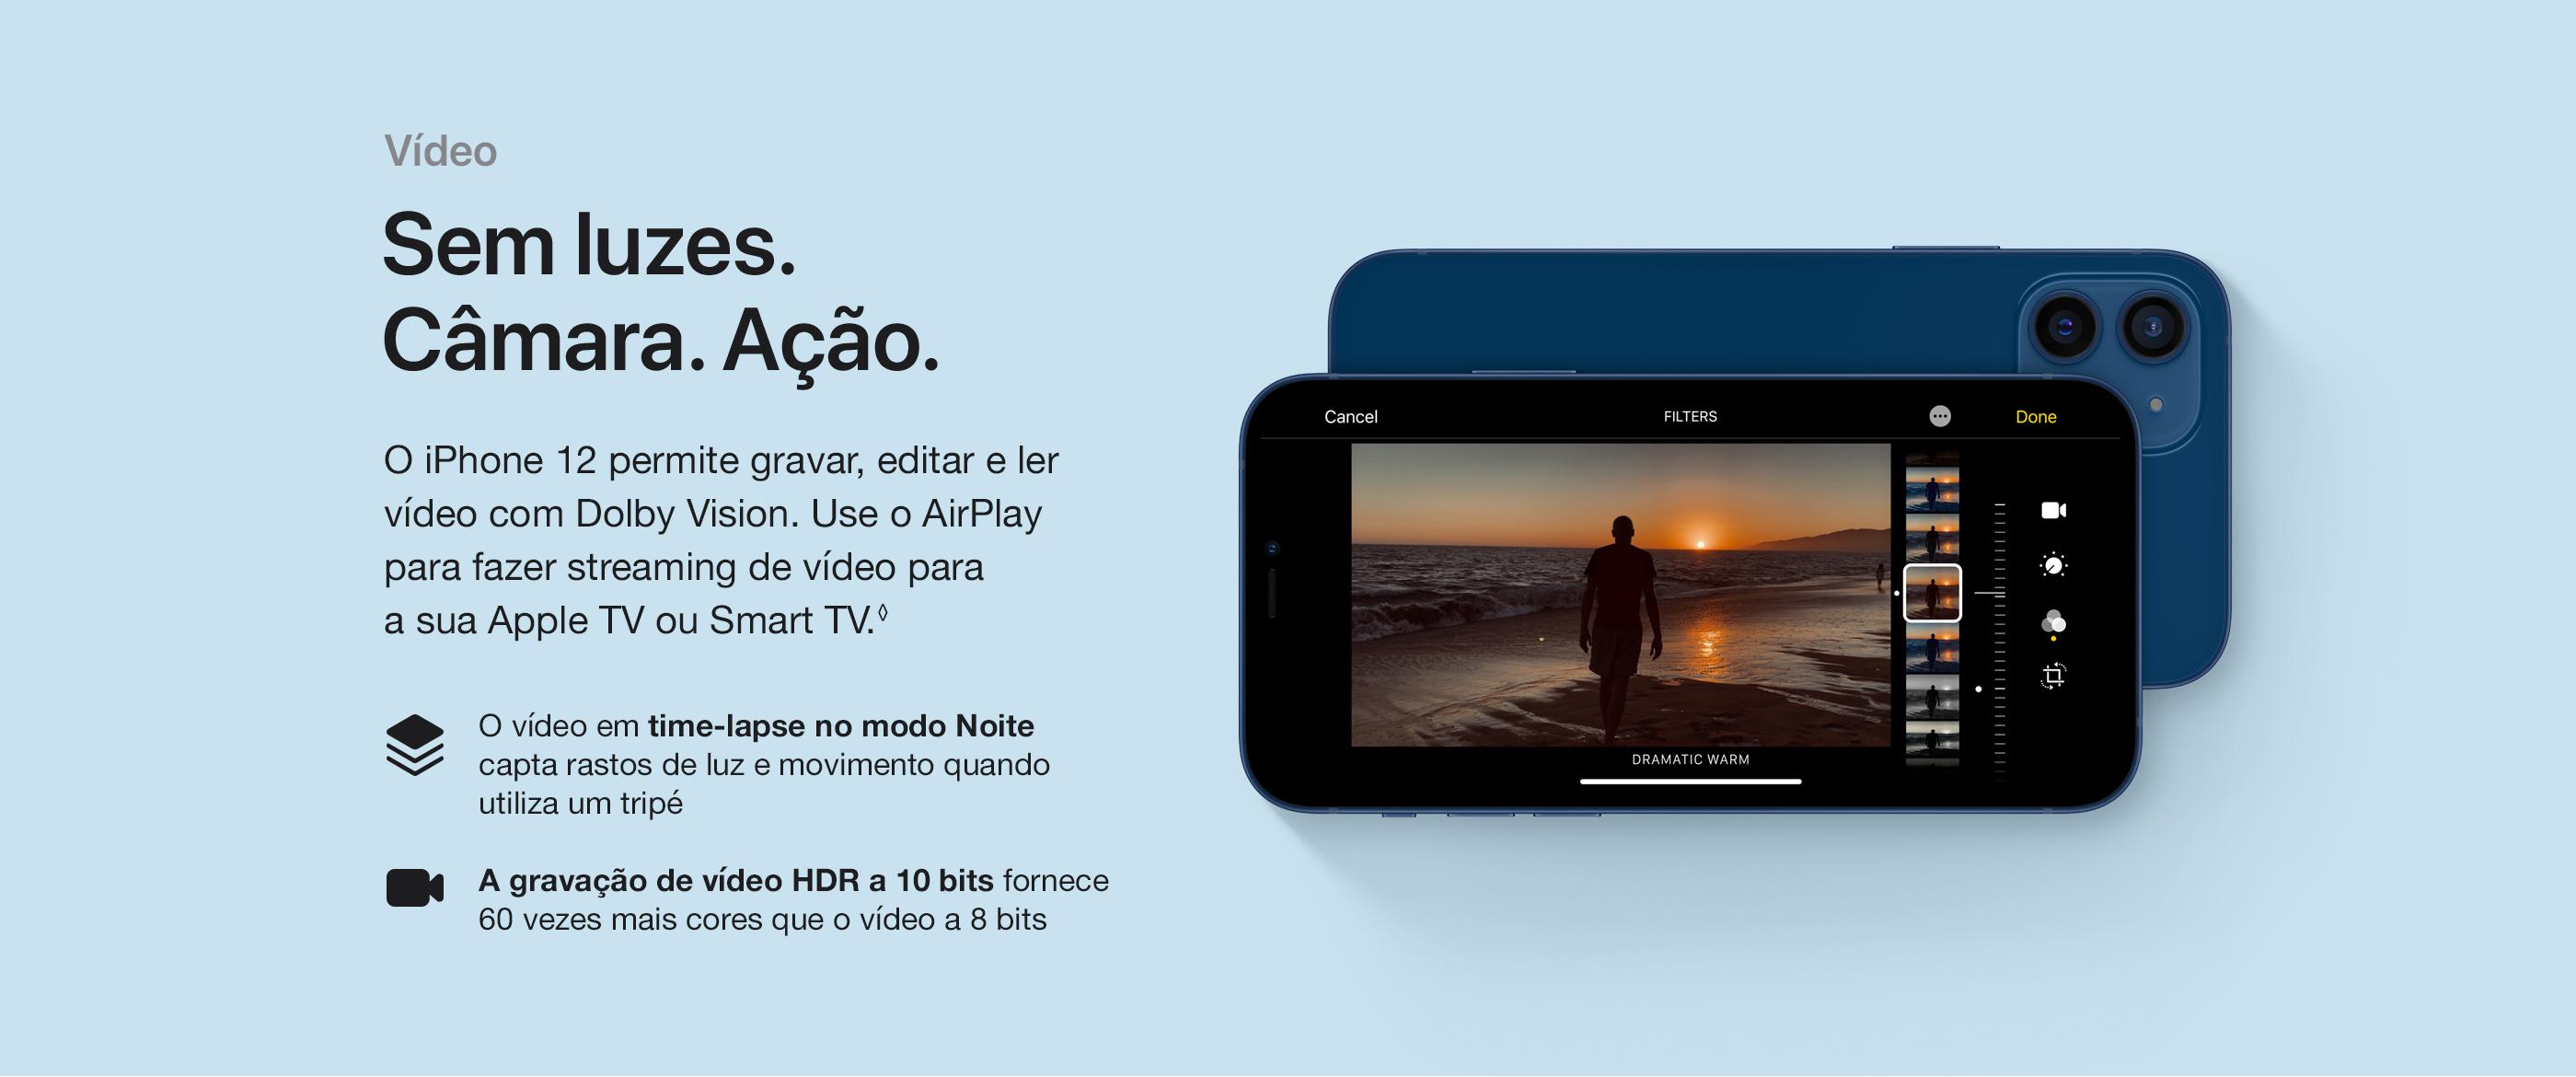 iPhone 12 e iPhone 12 Mini Vídeo